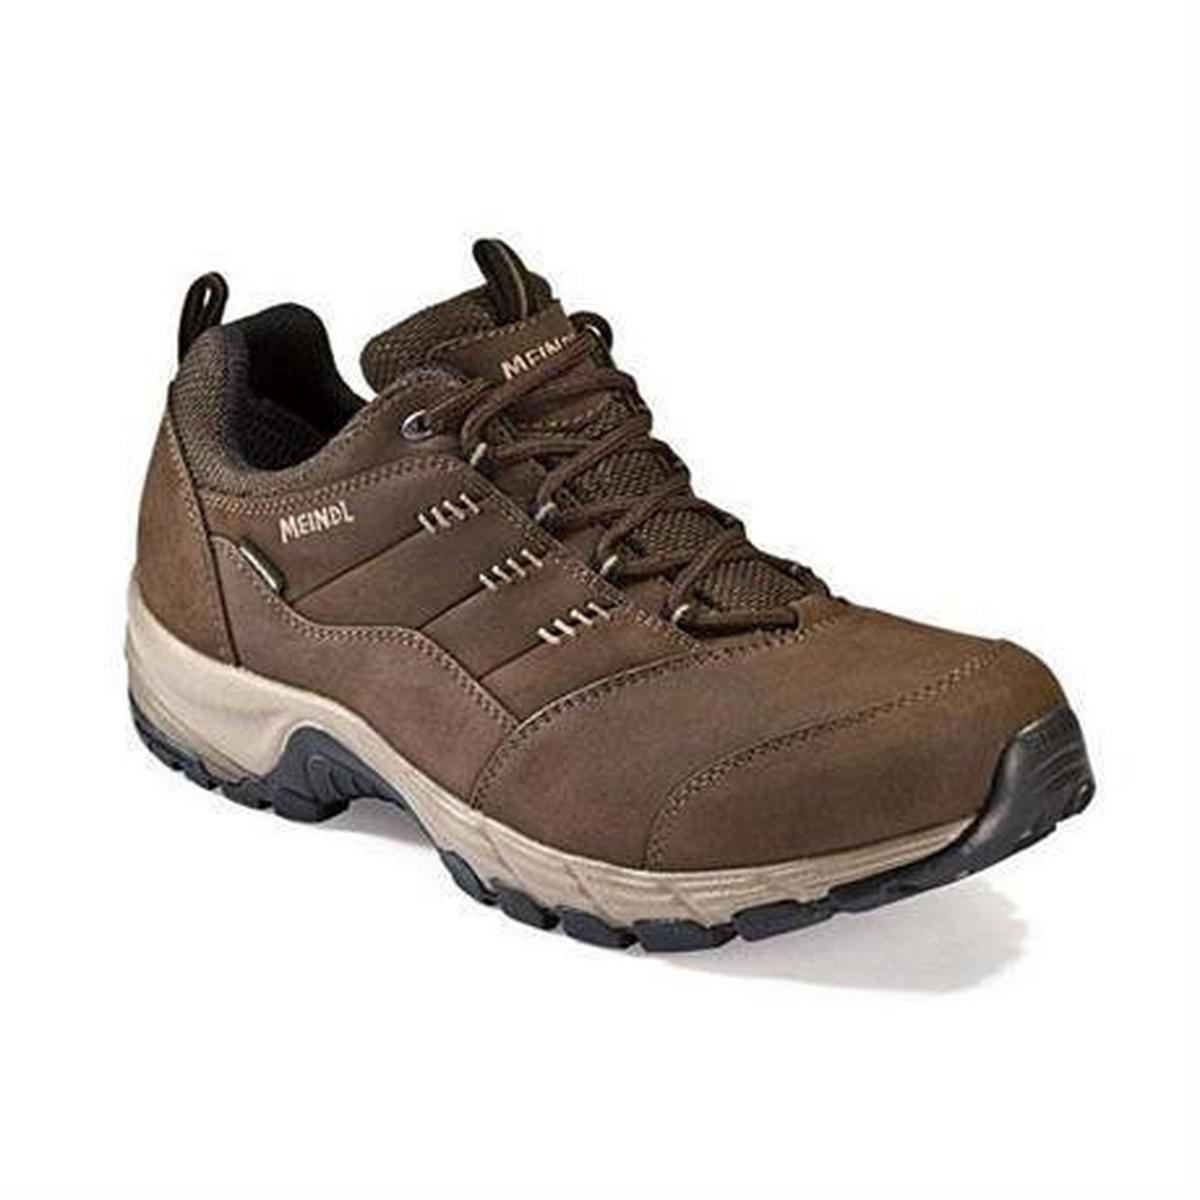 Meindl Shoes Men's Philadelphia GTX Braun